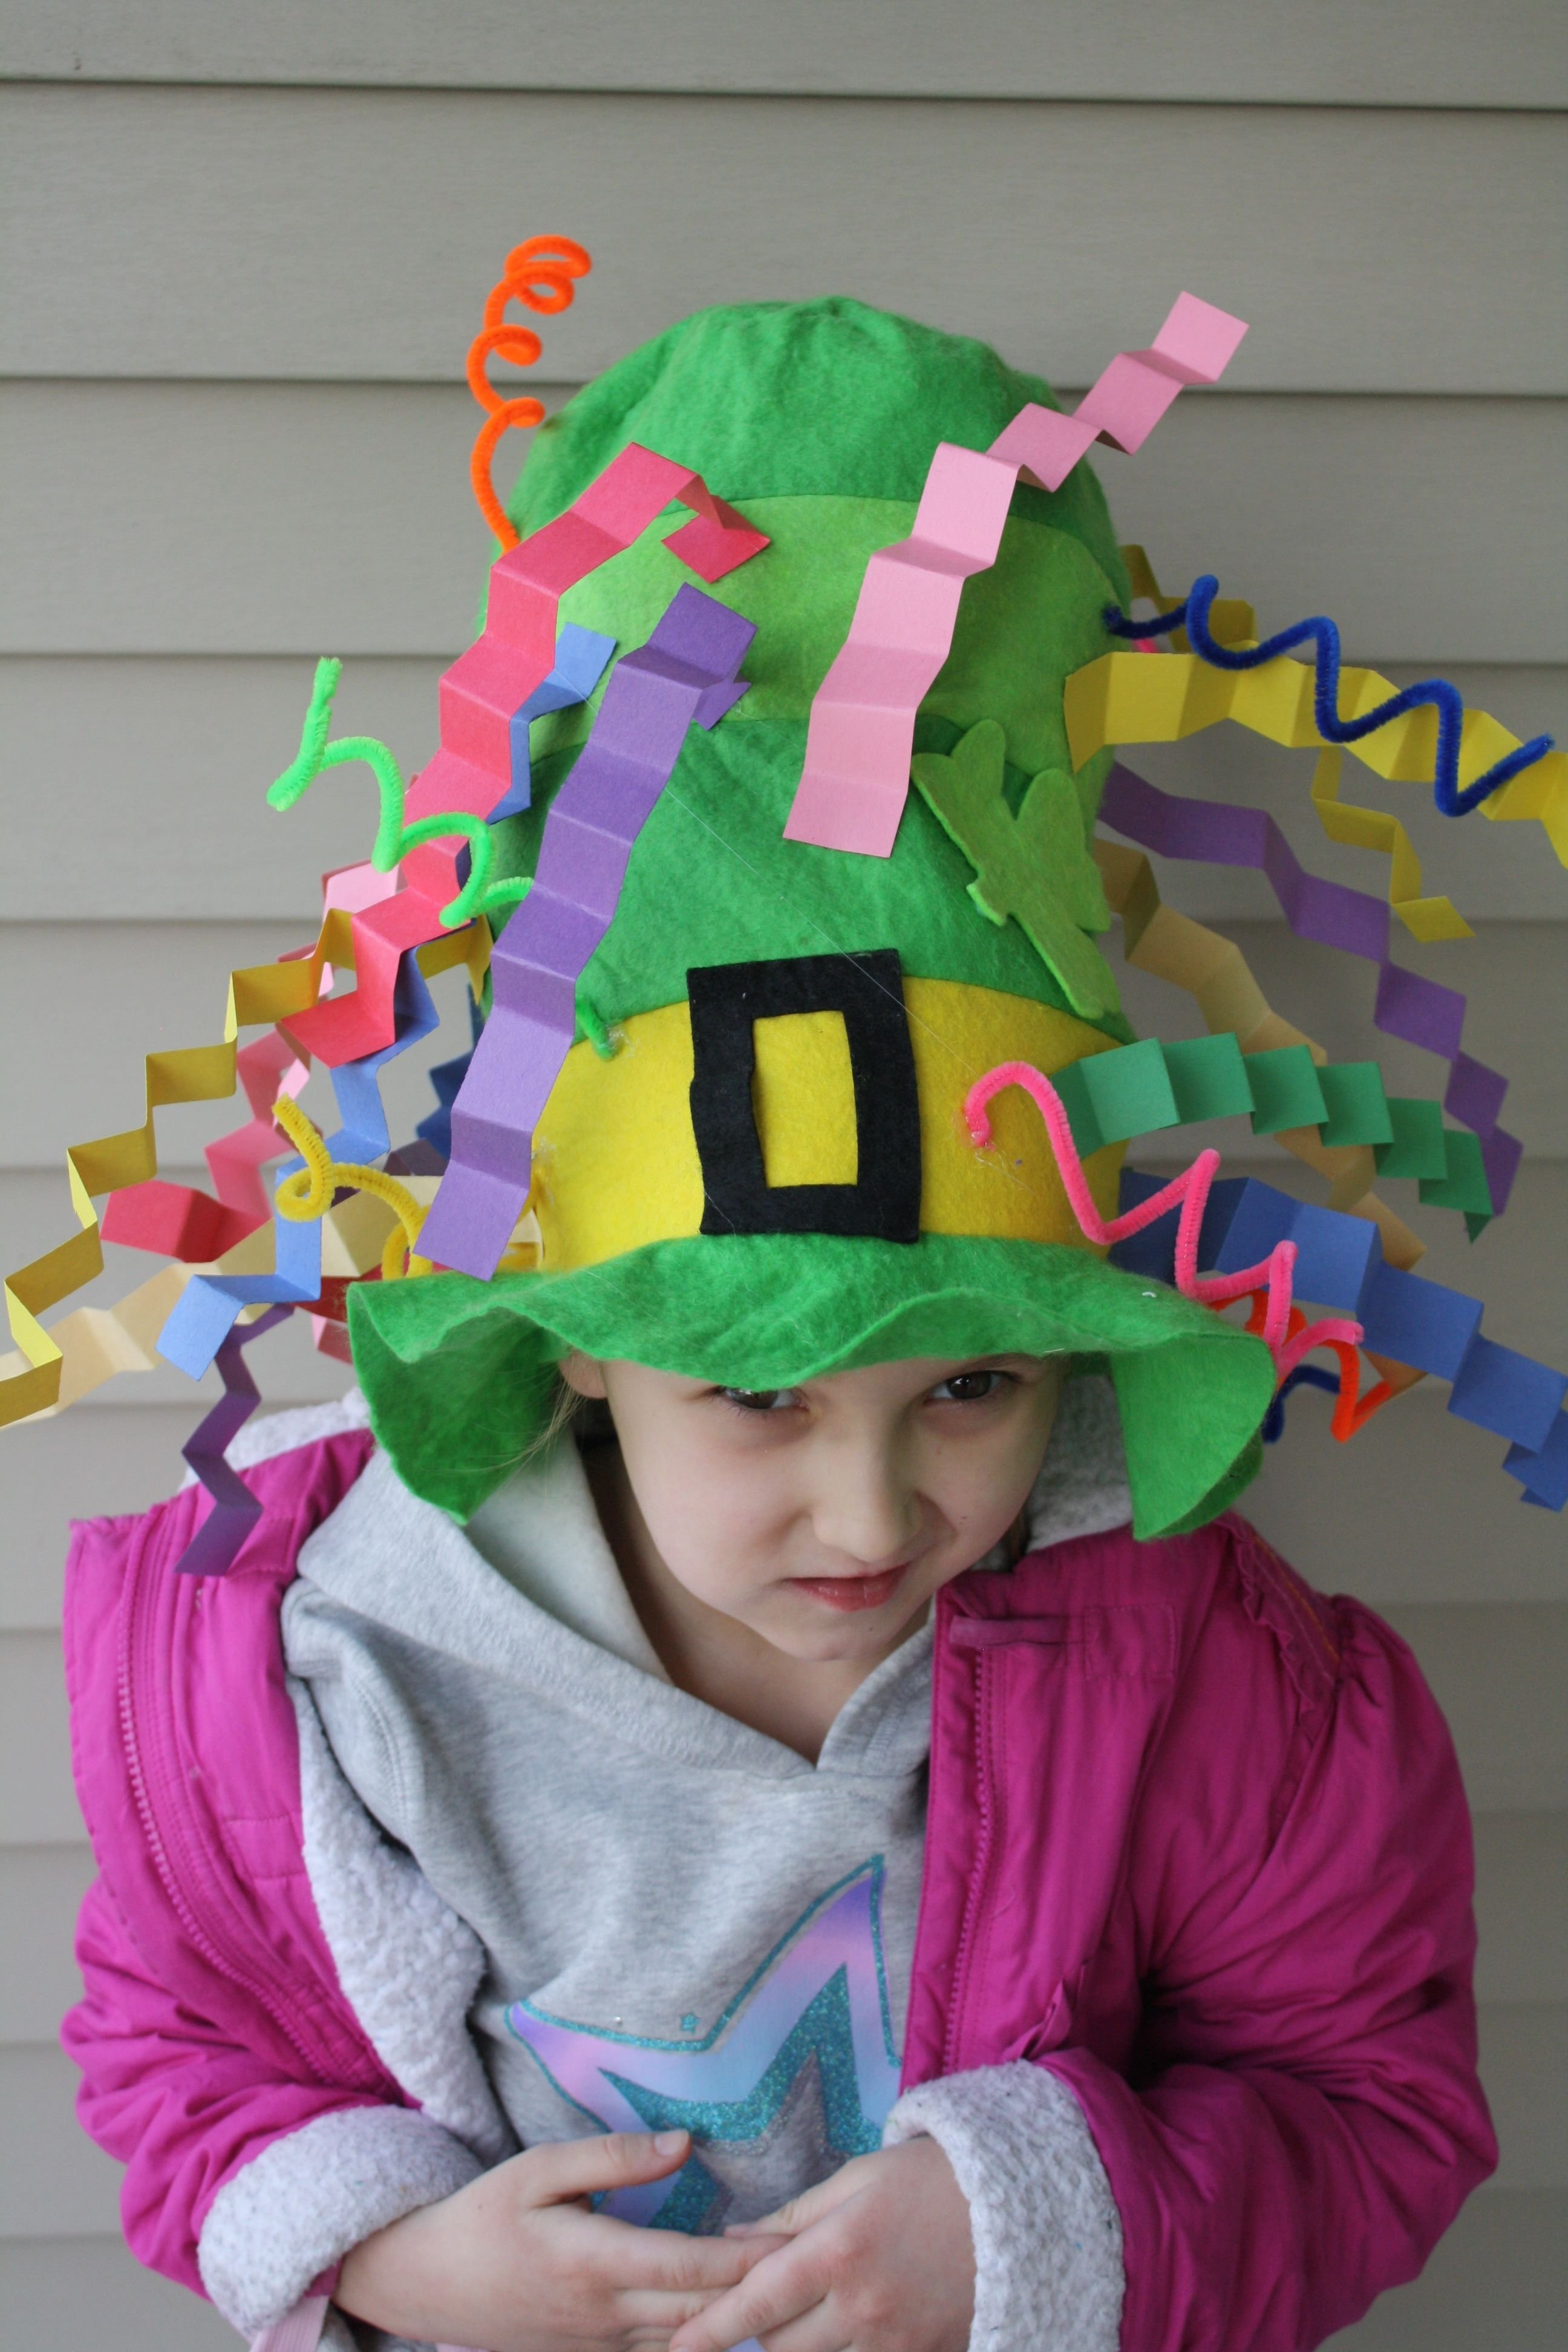 10 Fantastic Crazy Hat Ideas For Kids crazy hat day crazy hat day ideas for school happy mad hatter